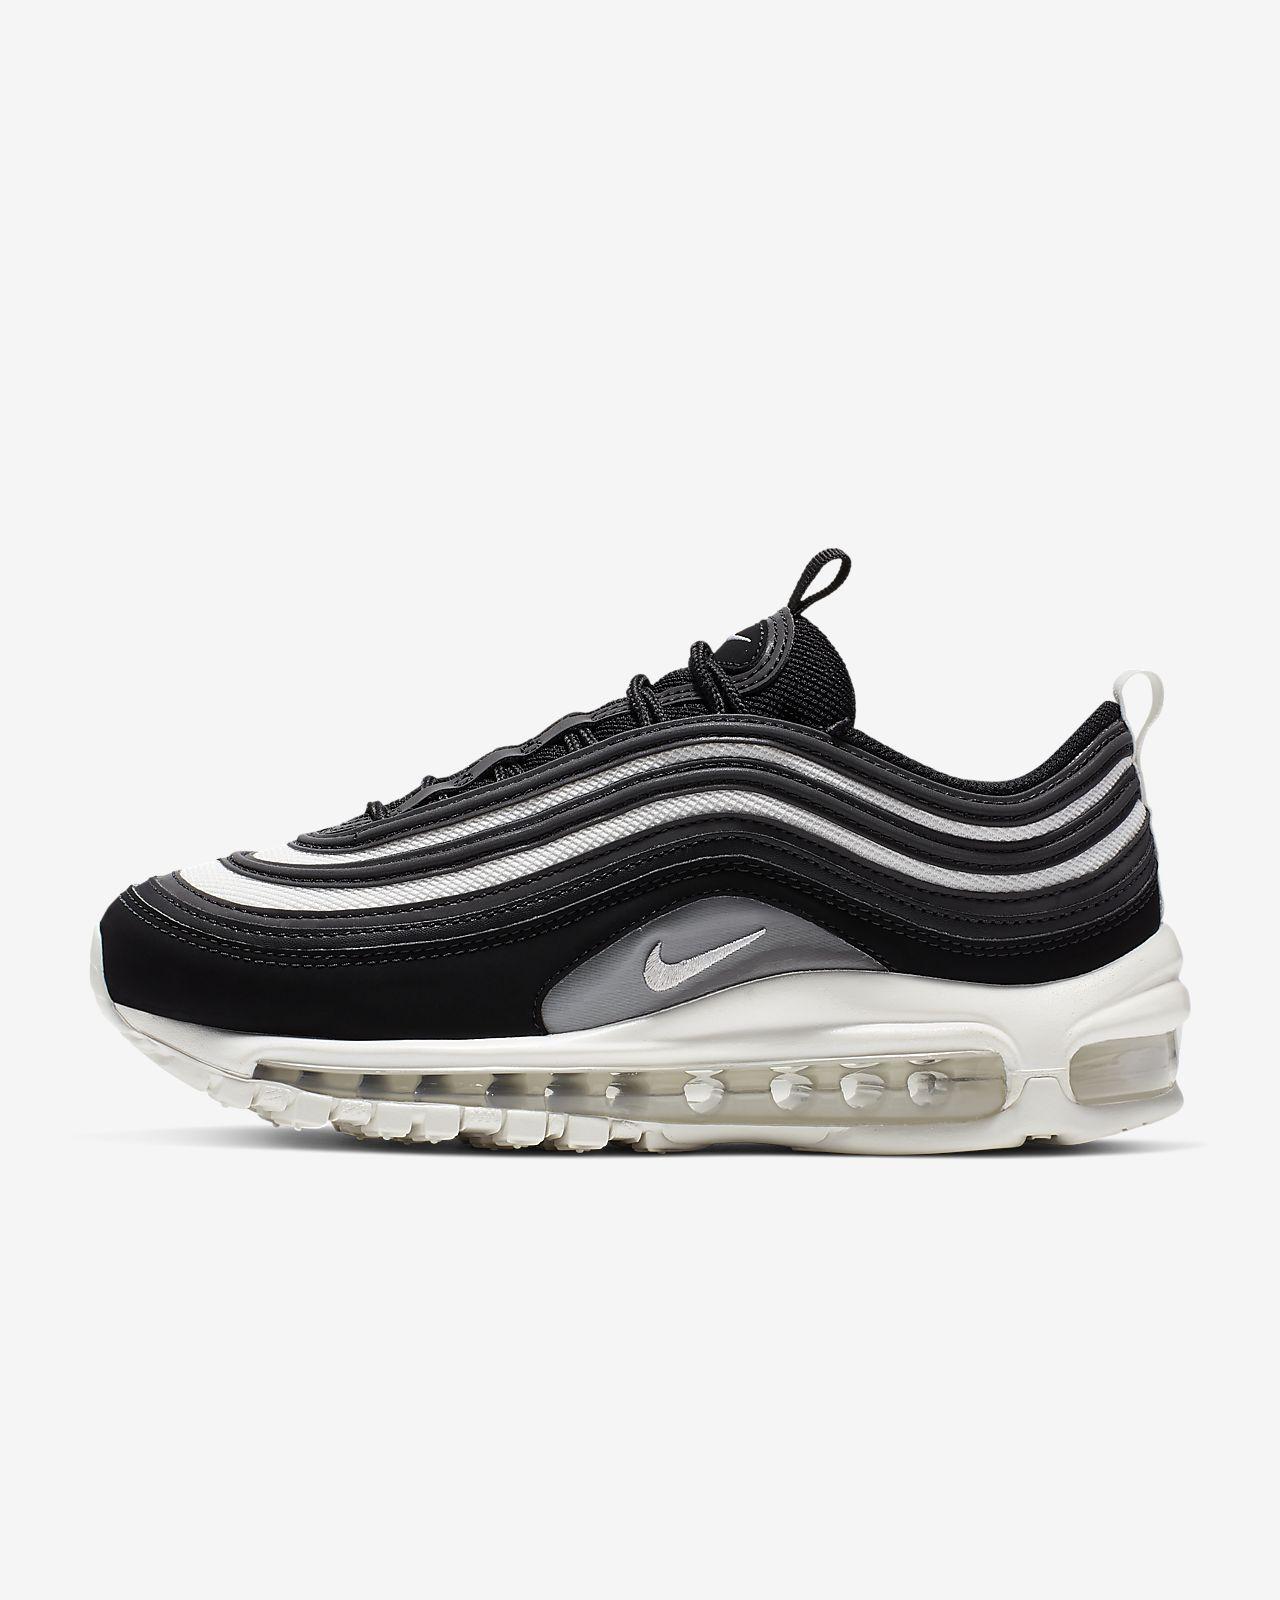 Nike Air Max 97-sko til kvinder